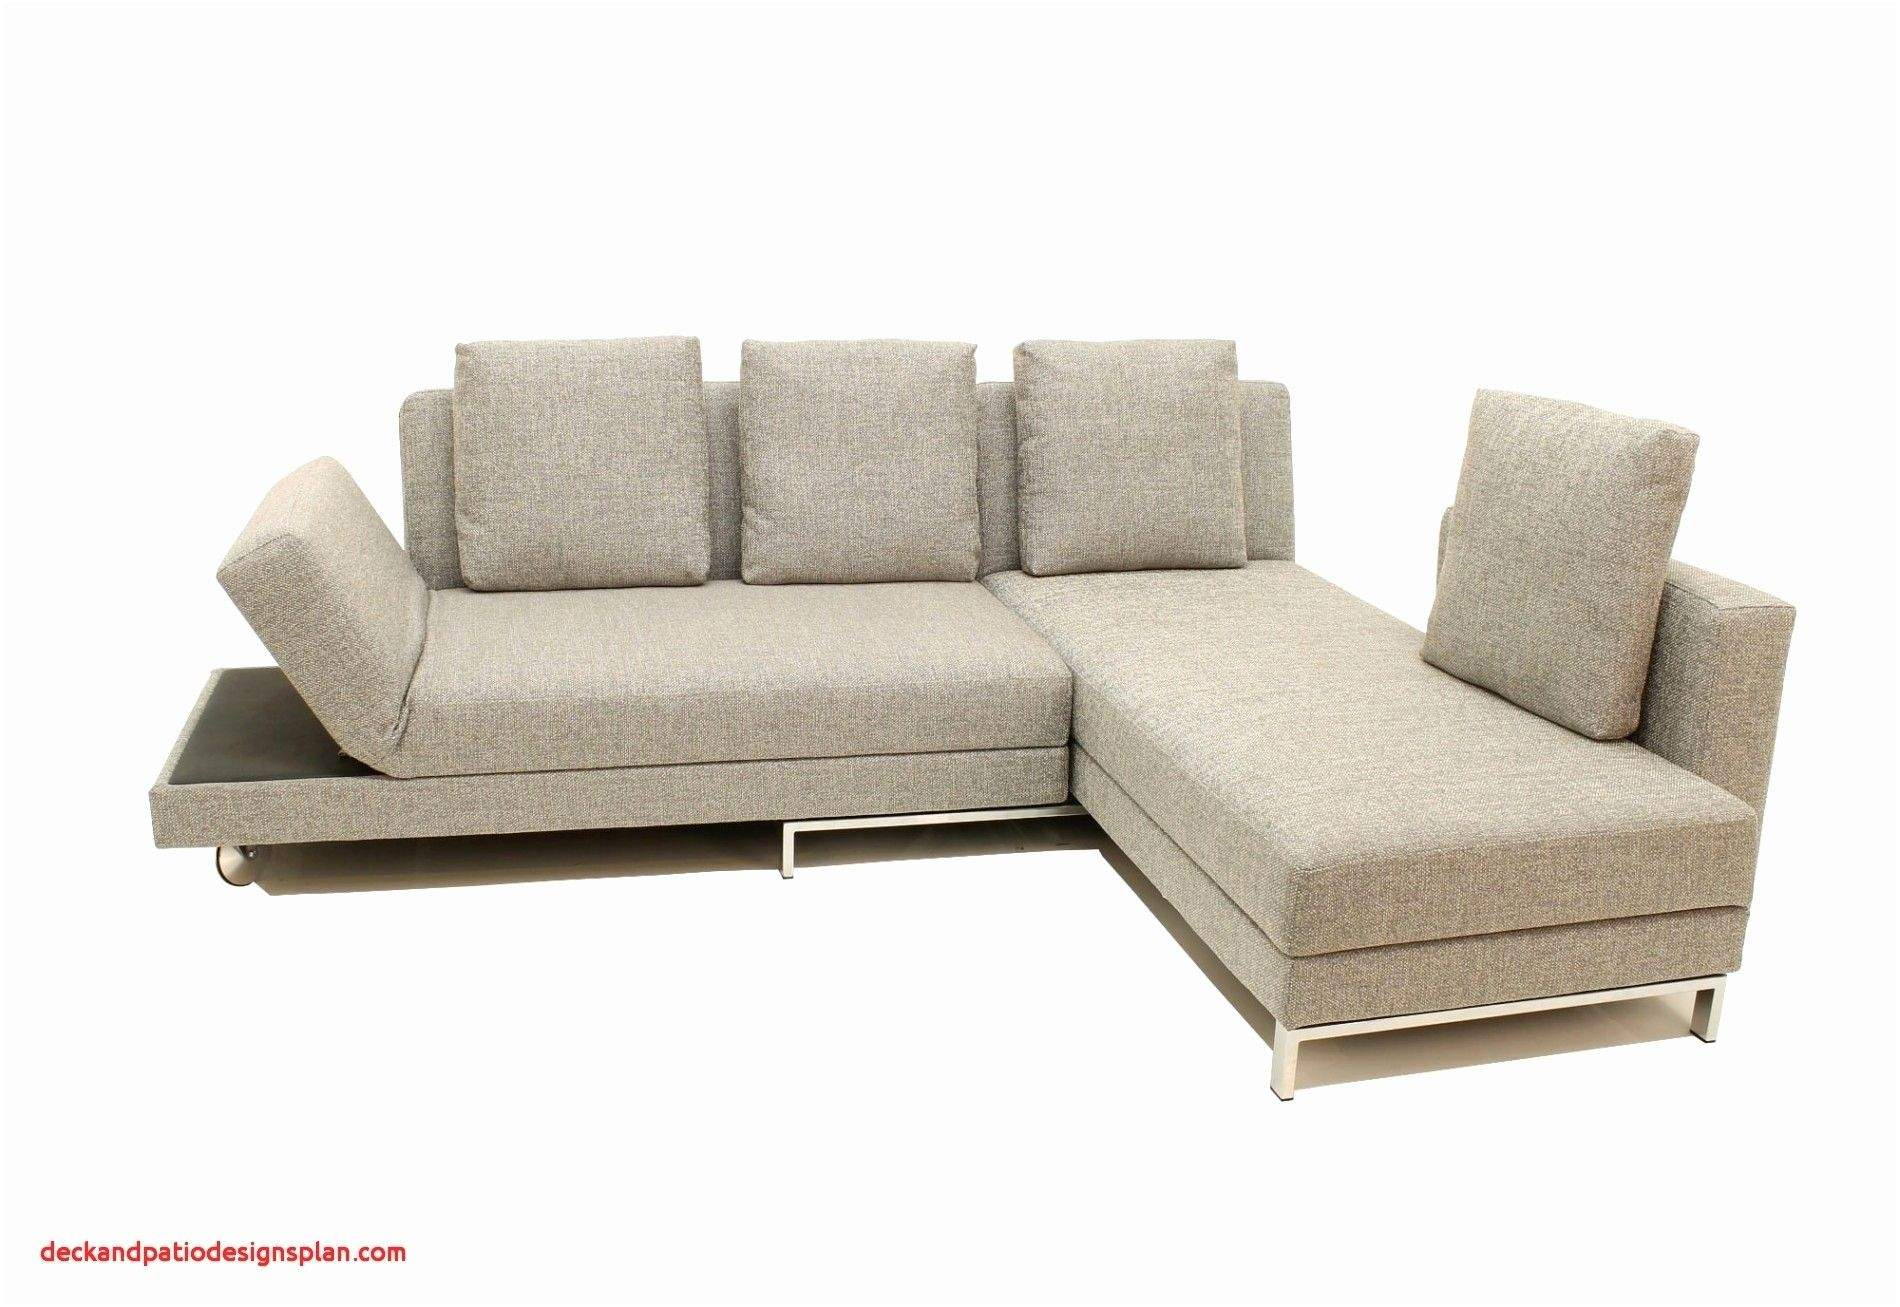 stuhl grau eiche stuhl grau eiche esszimmer couch leder sofa ohne lehne neu esszimmer couch 0d das